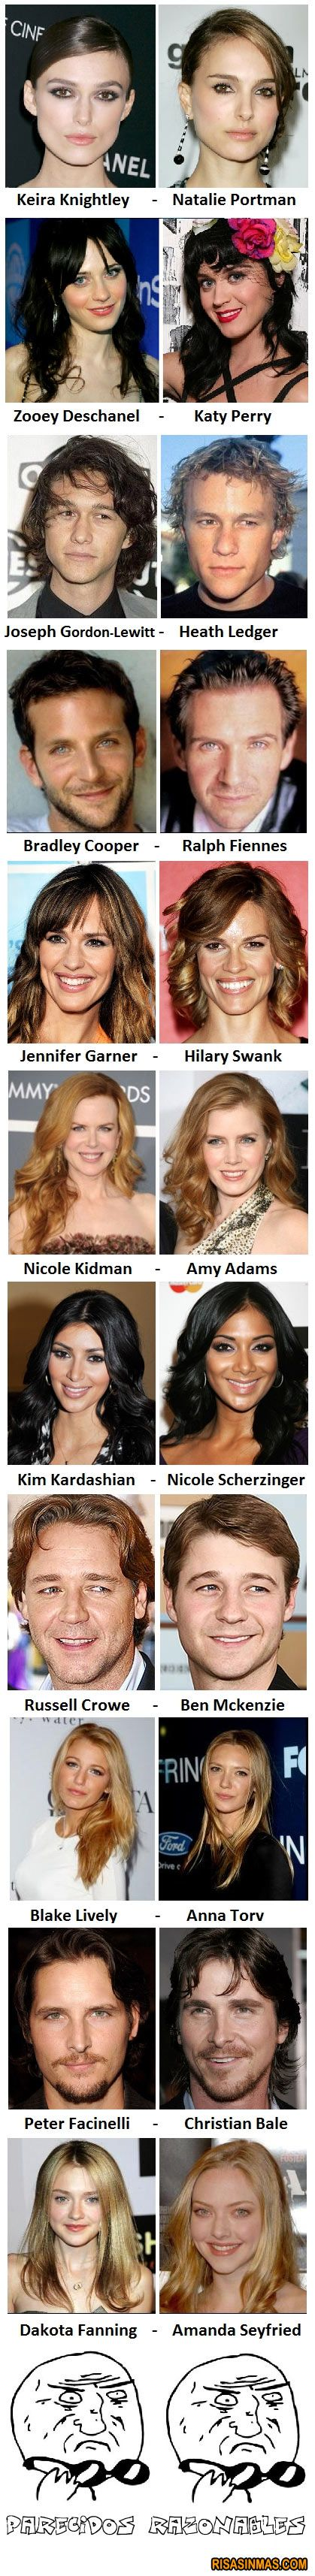 Parecidos razonables de famosos Ampliar imagen: http://bit.ly/JdJDpb